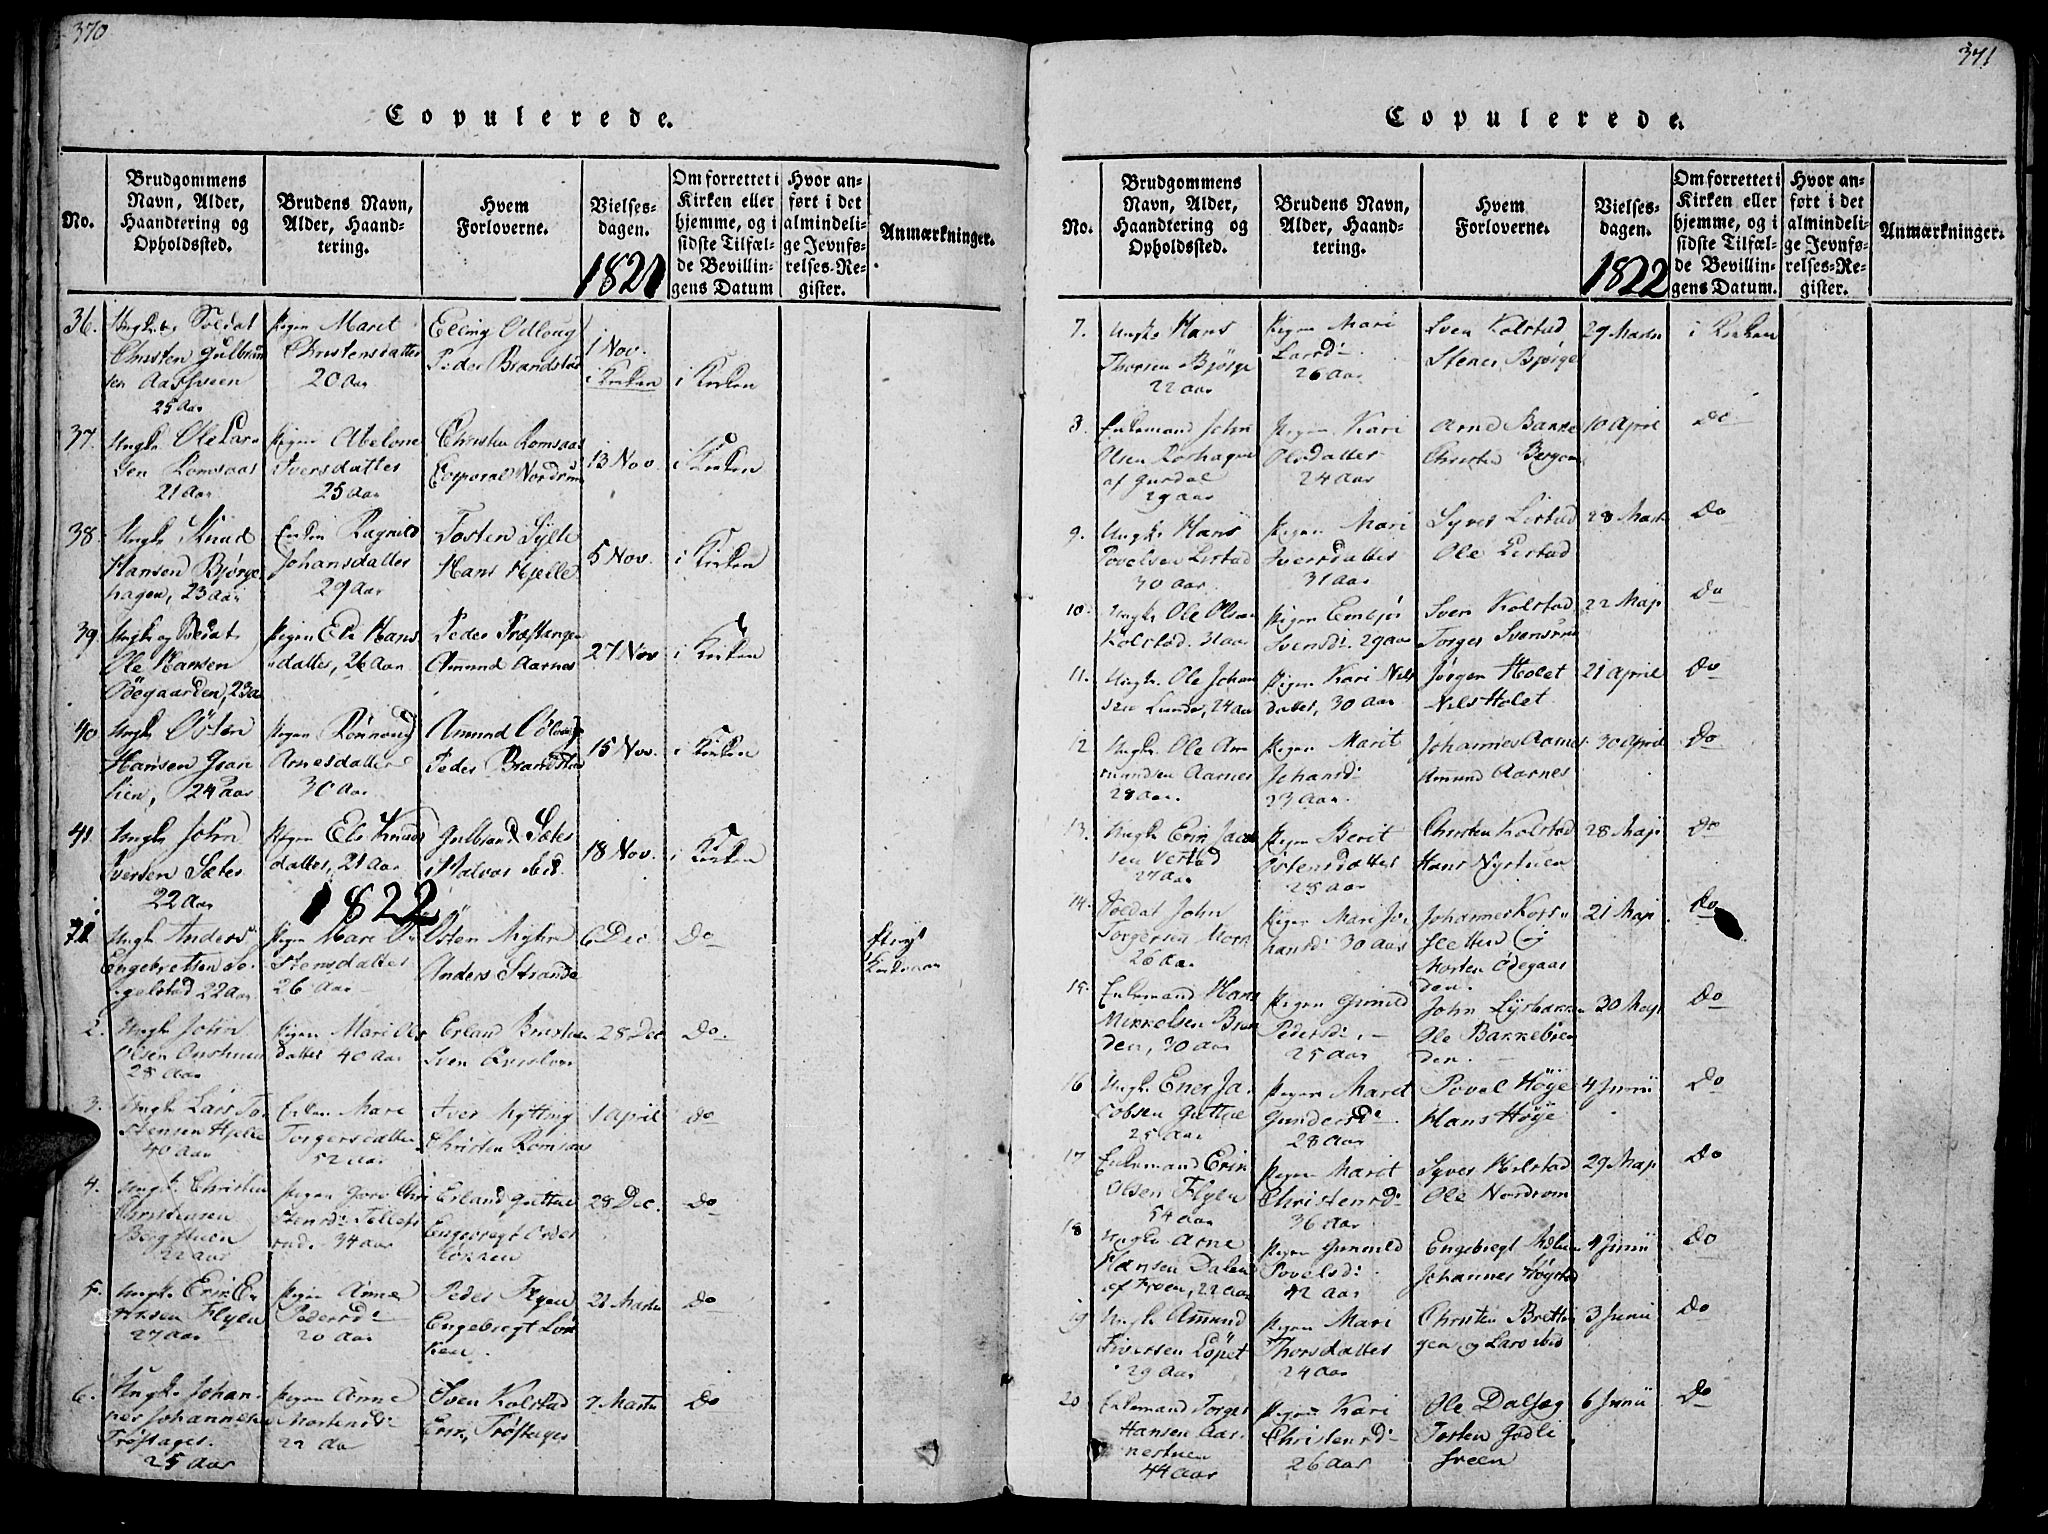 SAH, Ringebu prestekontor, Ministerialbok nr. 4, 1821-1839, s. 370-371